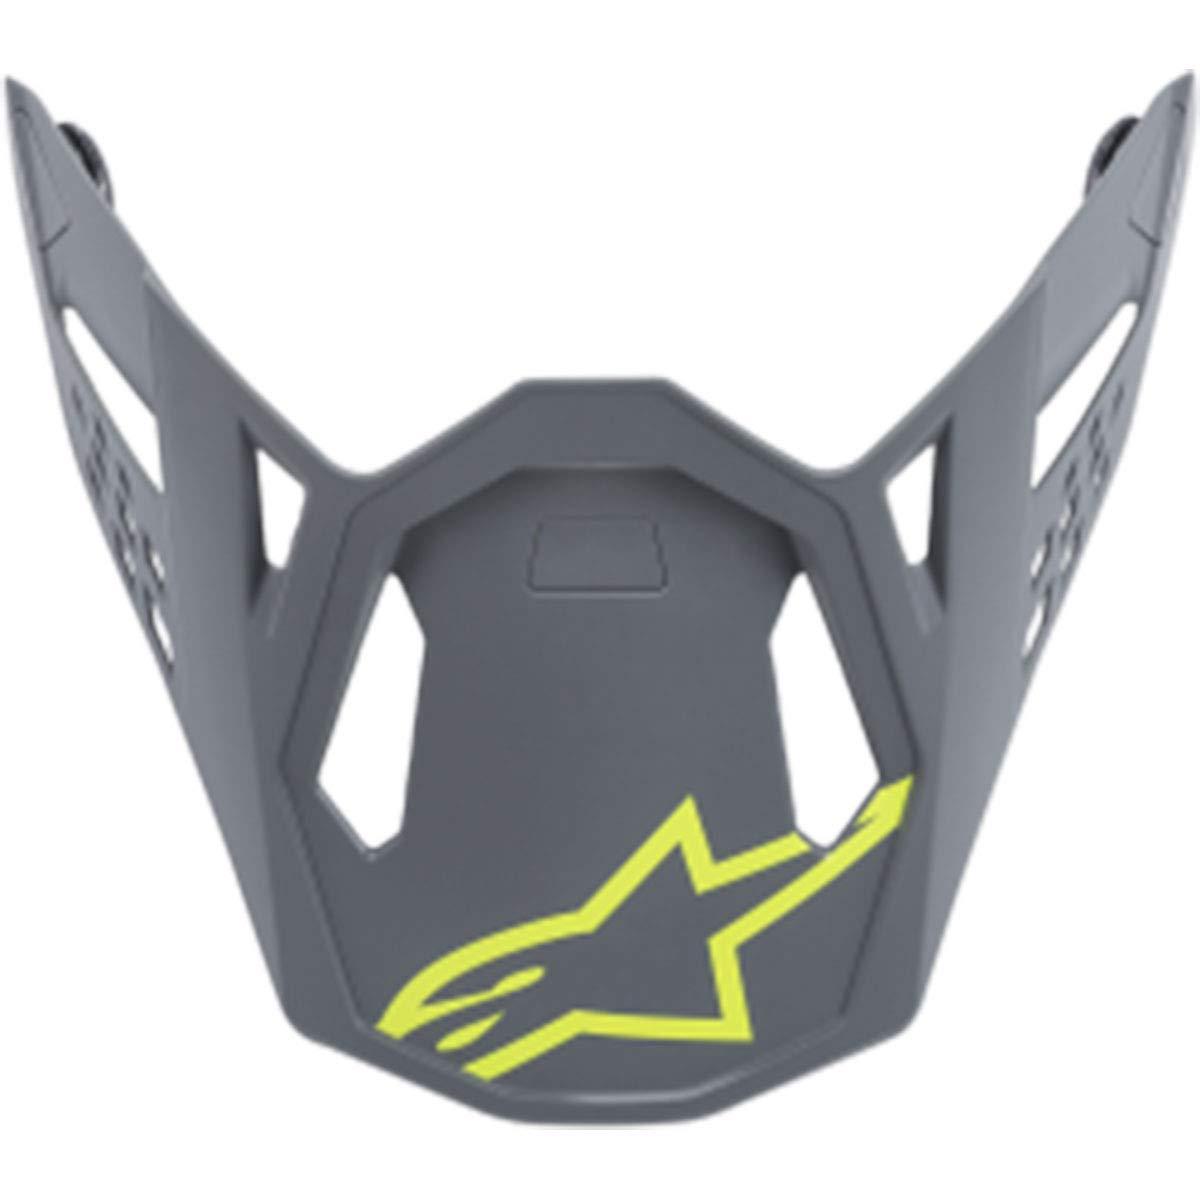 Alpinestars Supertech M8 Radium Visor Off-Road Motorcycle Helmet Accessories - Matte Gray/Fluorescent Yellow/One Size